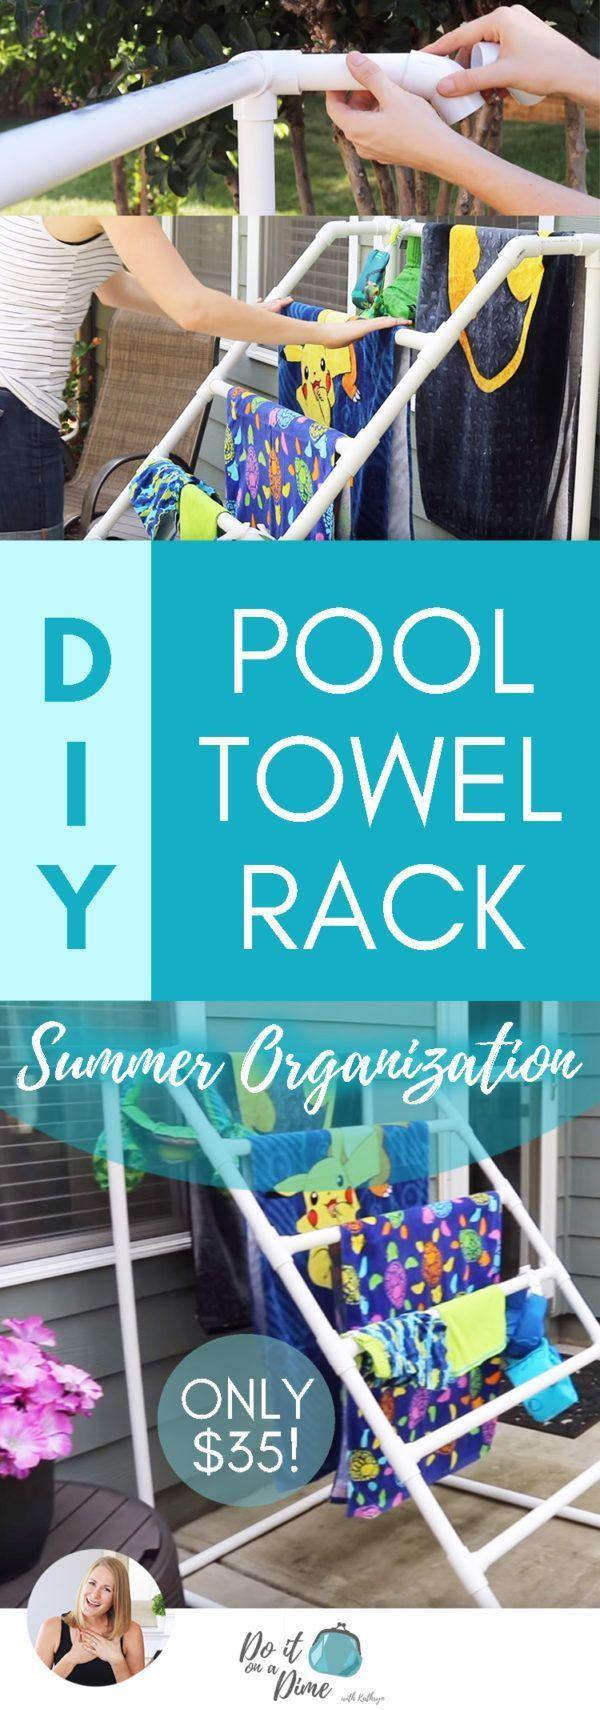 #towelrack #$300 #POOL #TOWEL  $300 POOL TOWEL RACK FOR JUST $35! | Summer Organ…